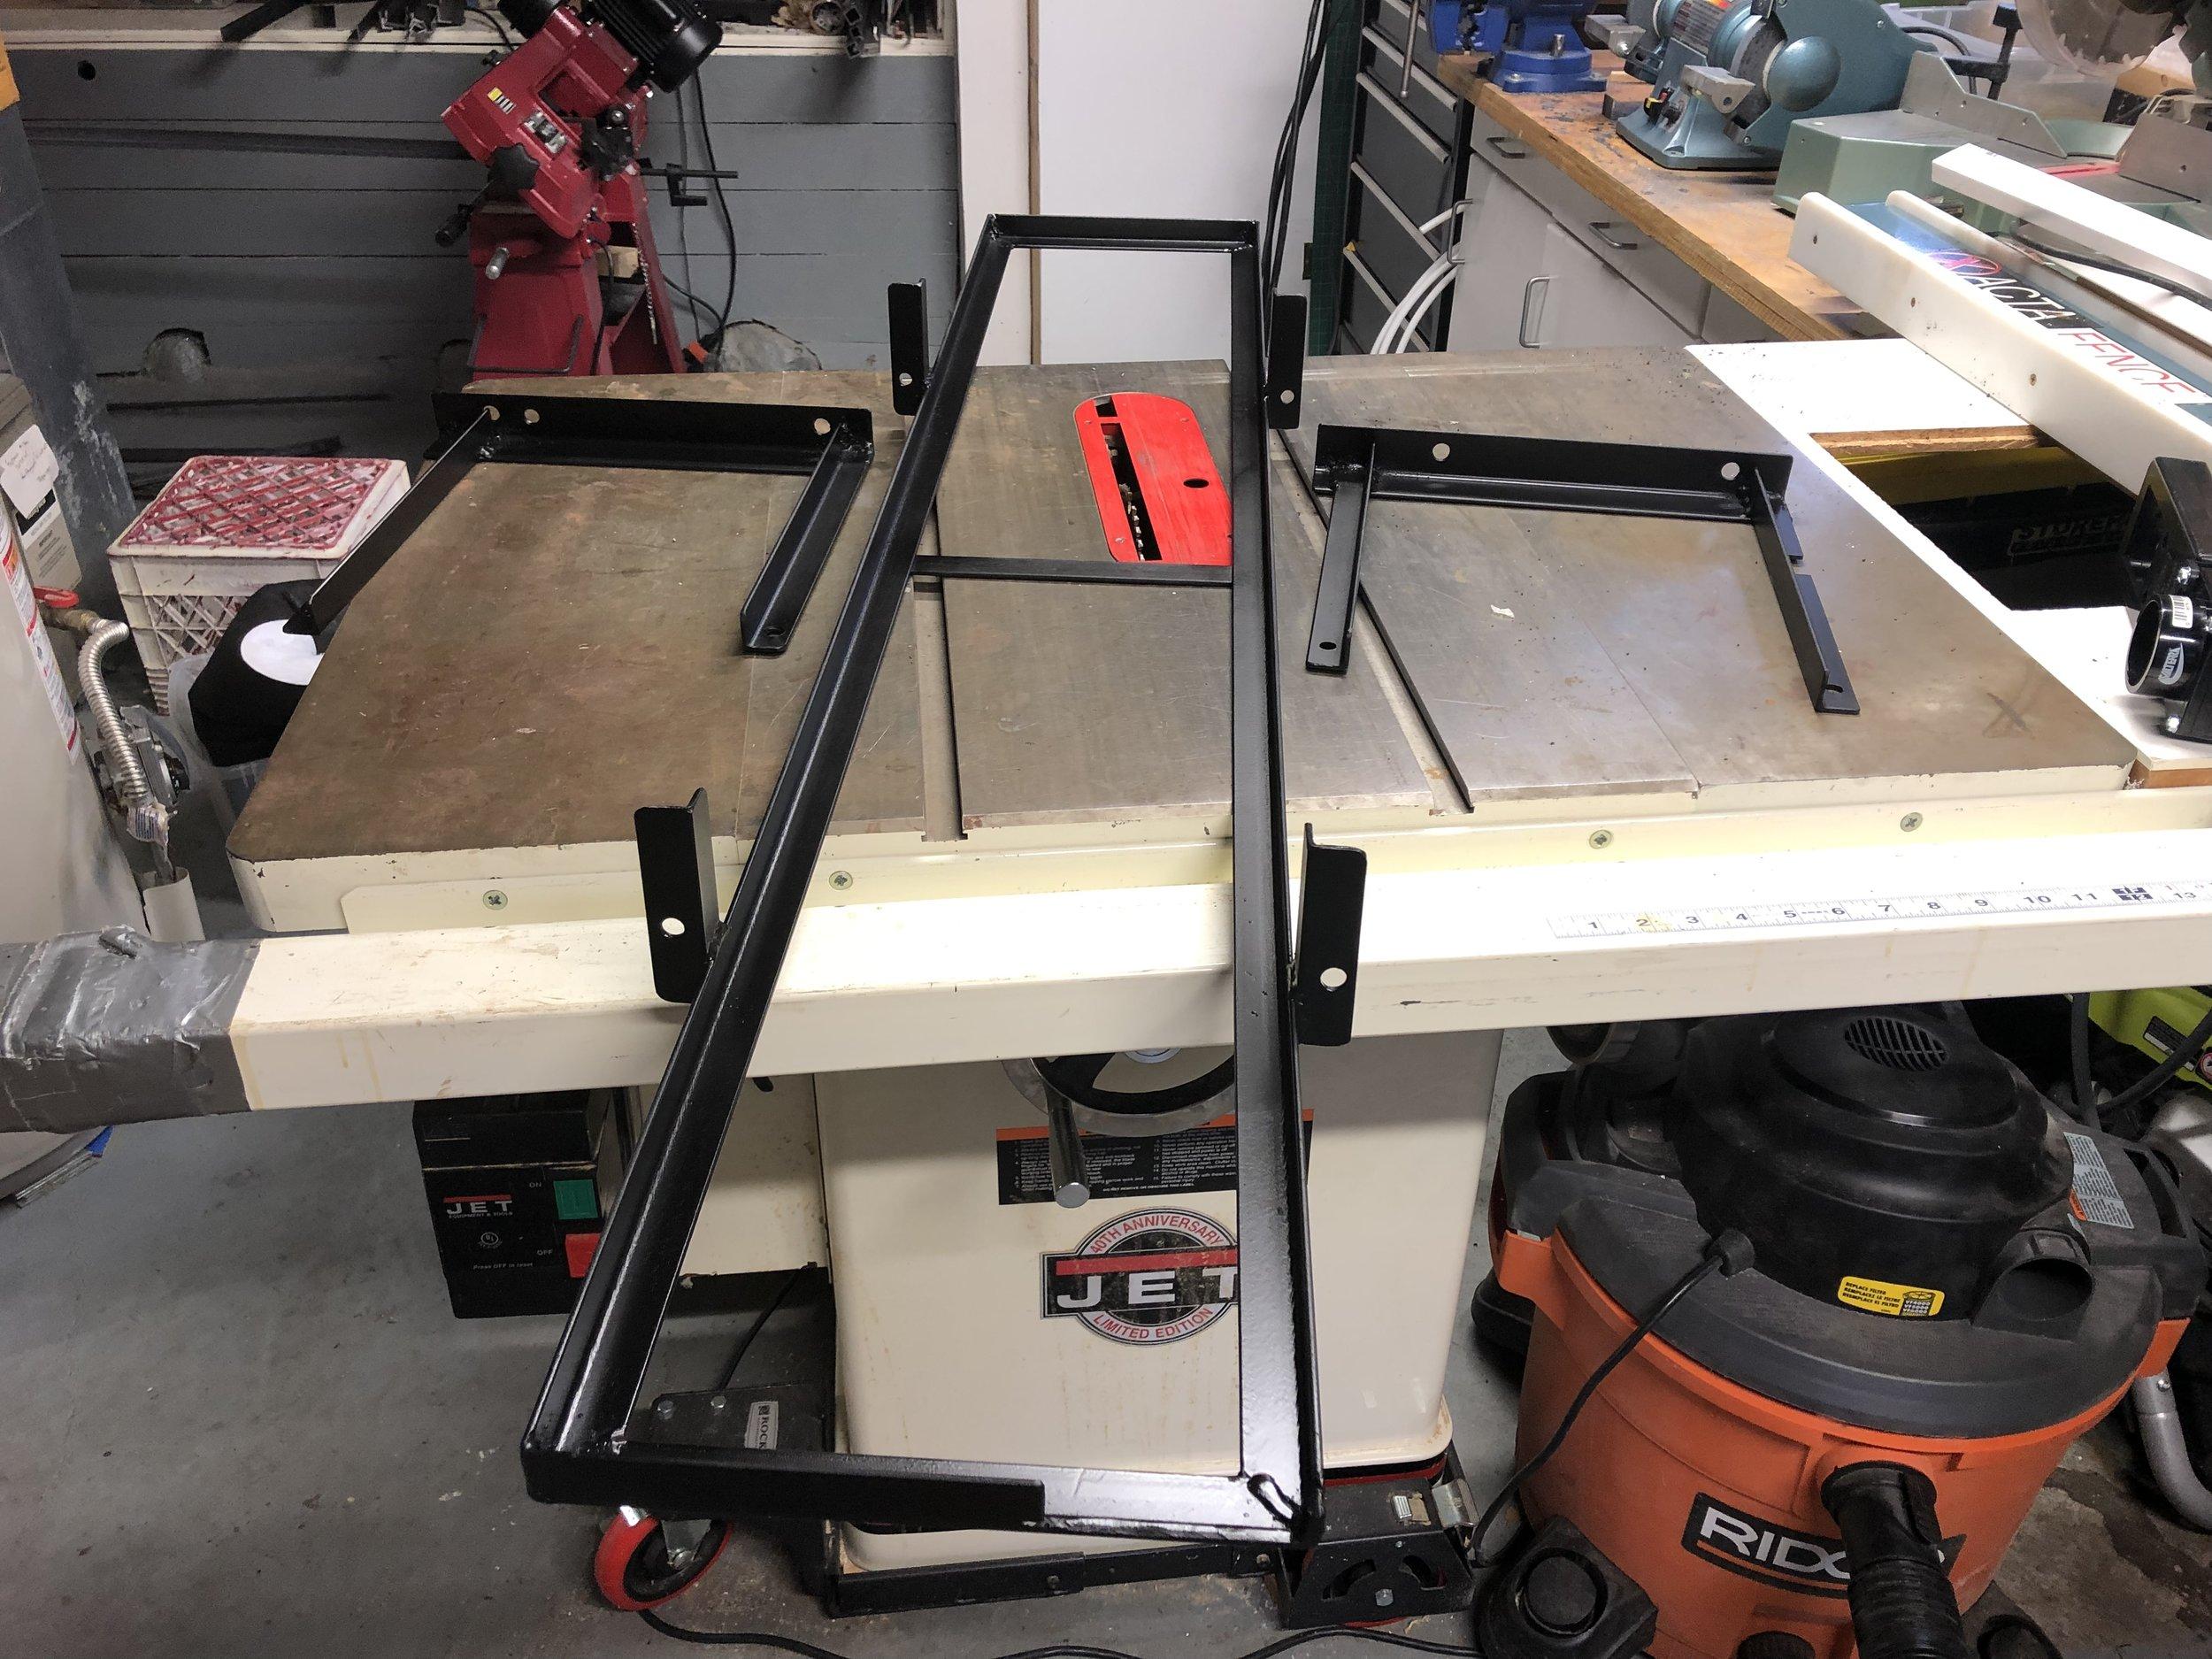 Tray and brackets